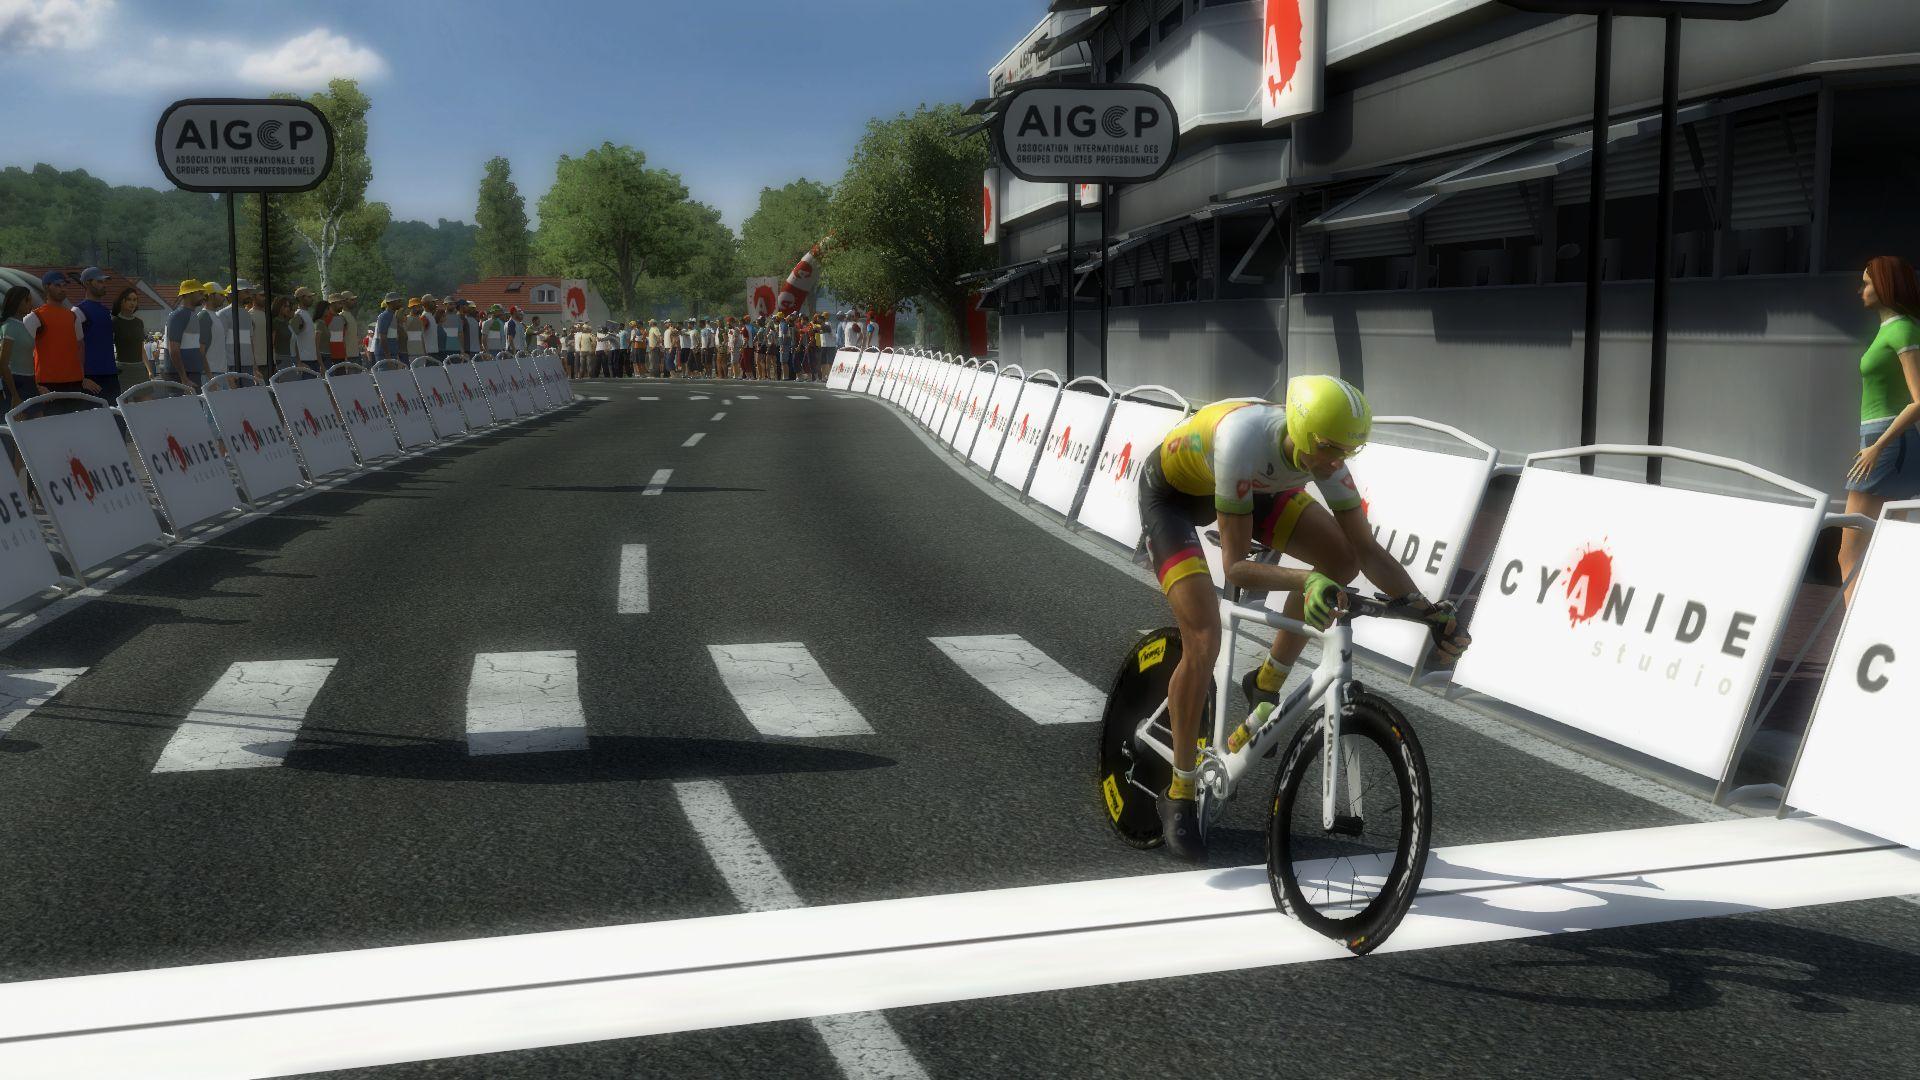 pcmdaily.com/images/mg/2019/Races/C1/Bayern/S4/mg19_bay_s04_48.jpg